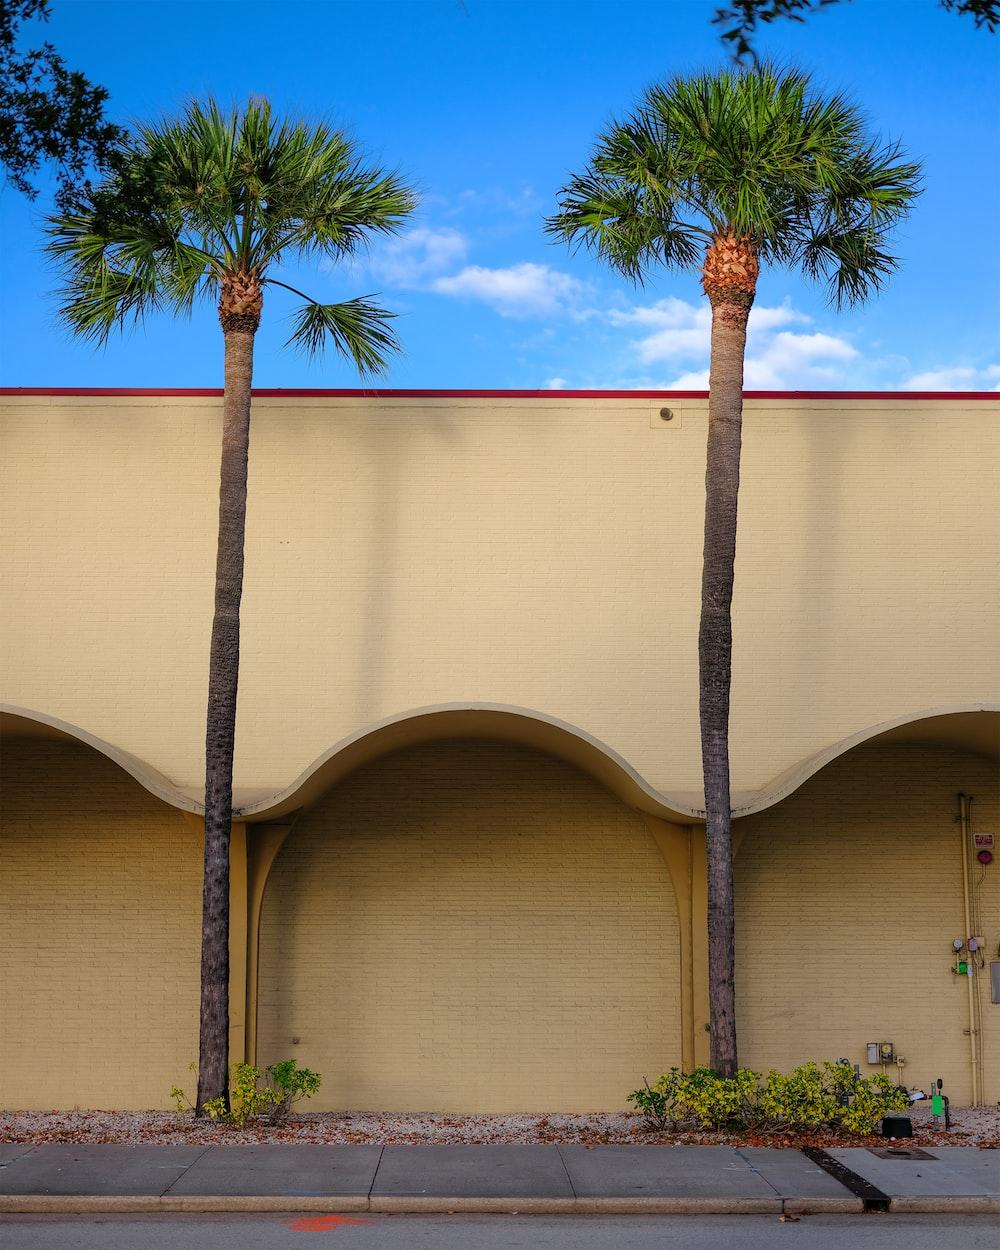 palm tree beside beige concrete building